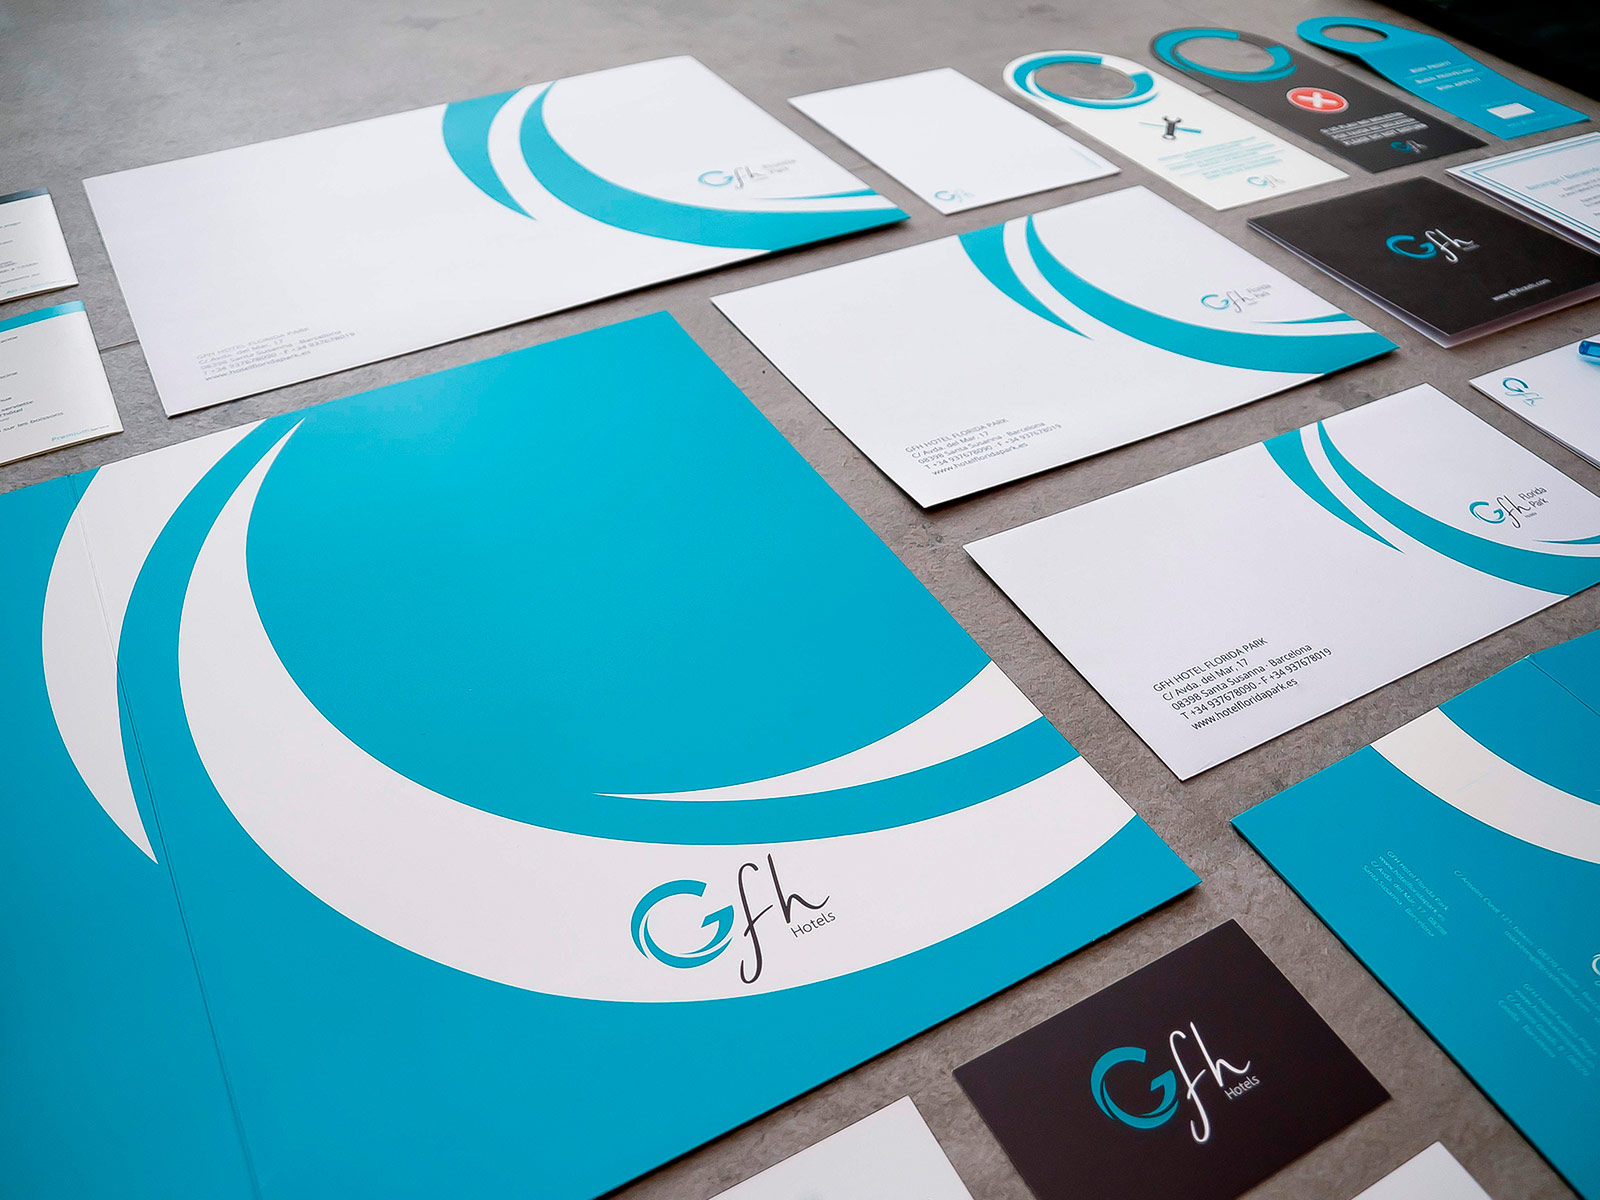 diseño grafico  Identidad corporativa     10